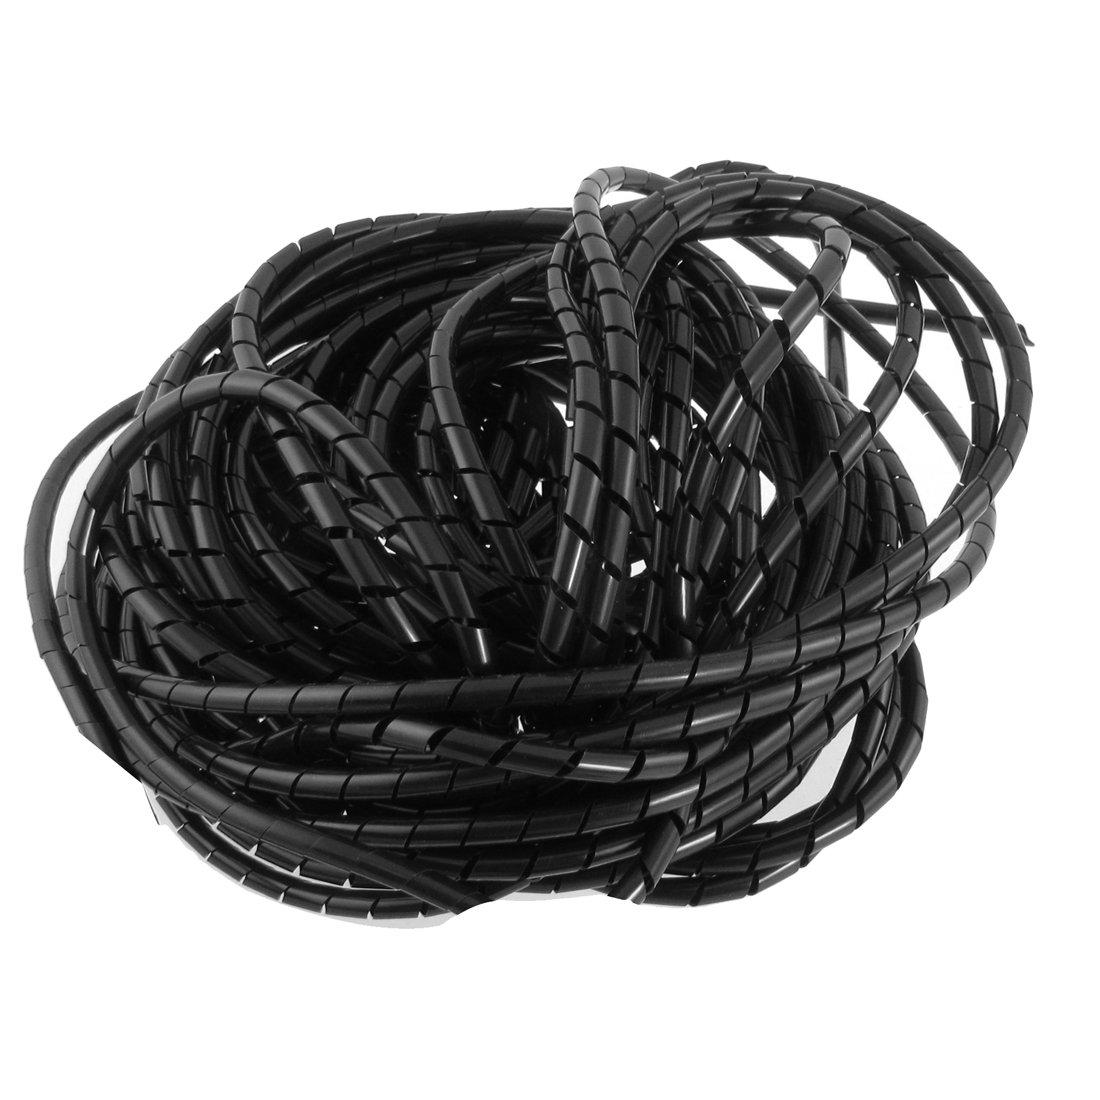 Amazon.com: Uxcell a12020800ux0294 Polyethylene Spiral Wire Wrap ...